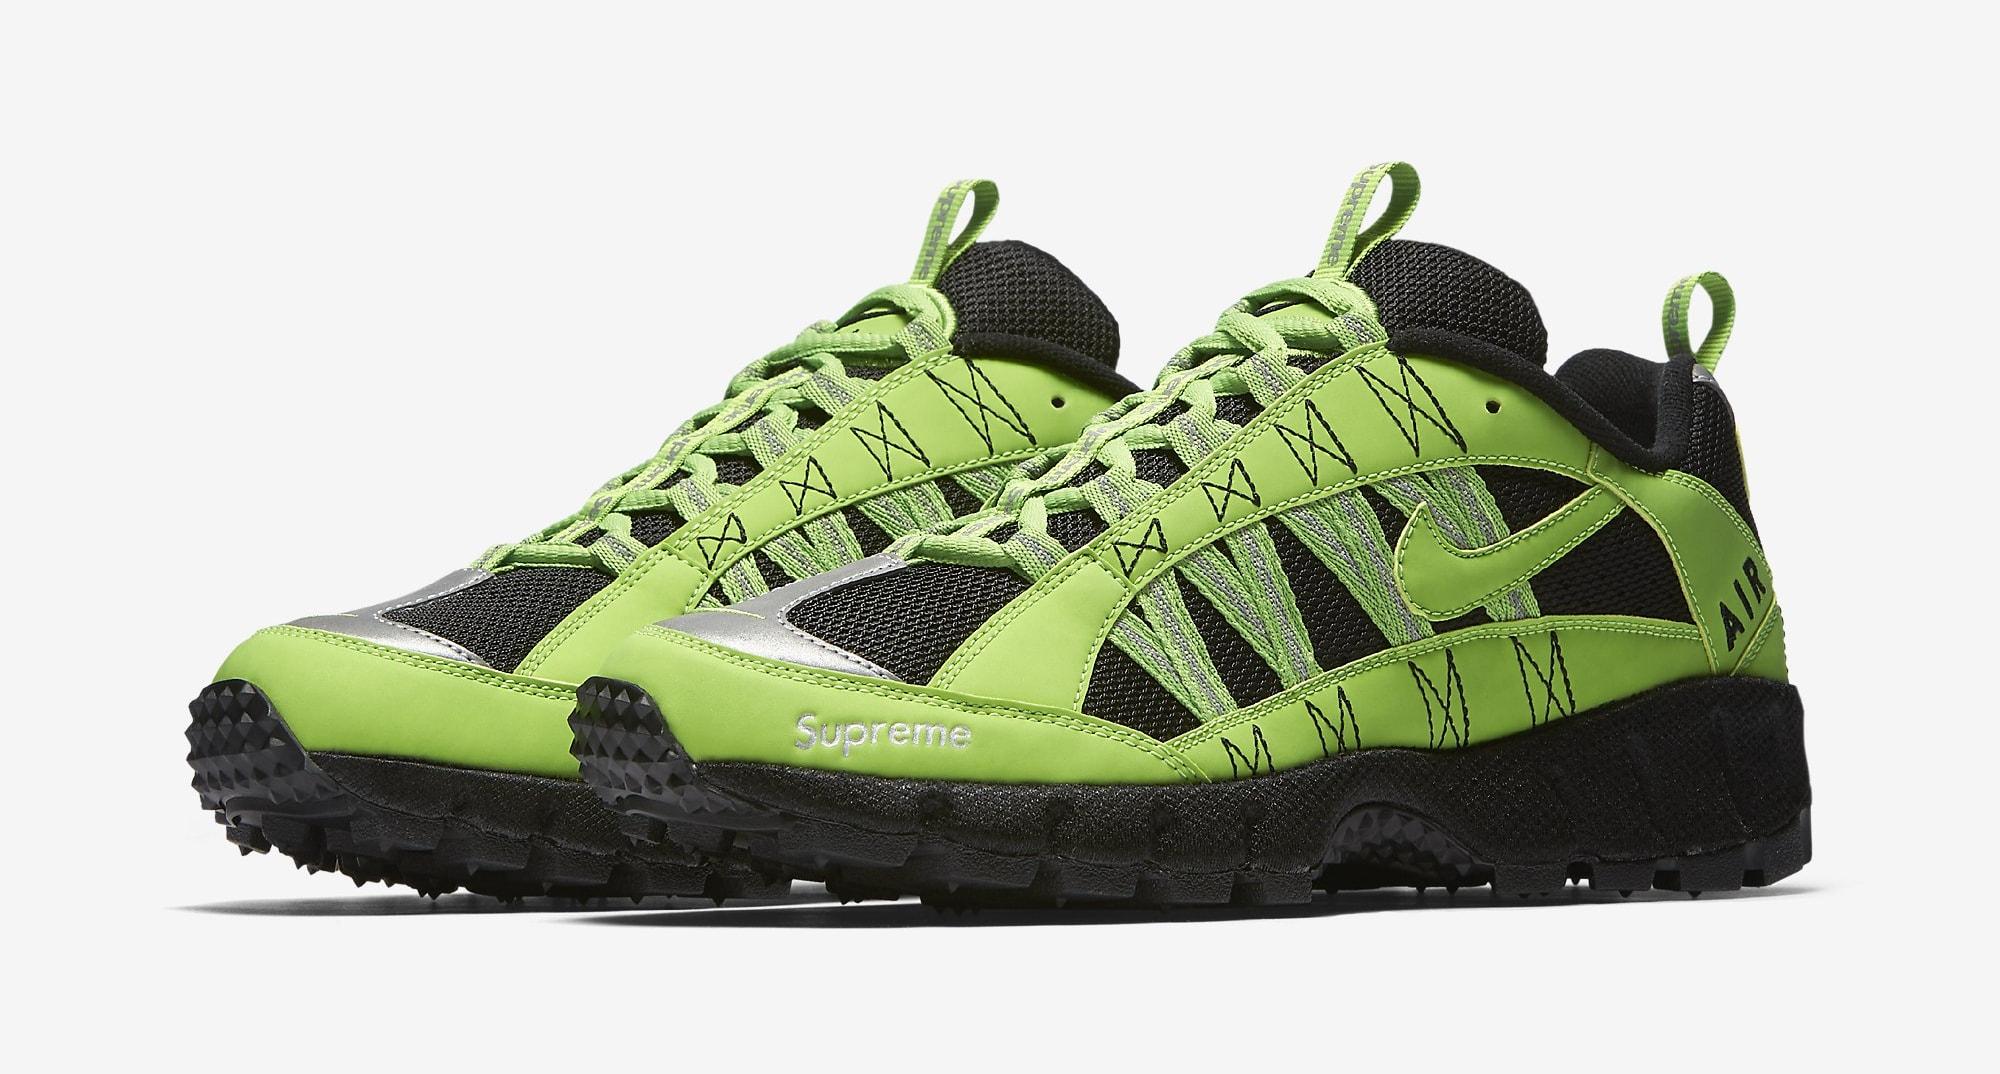 Supreme x Nike Air Humara '17 924464-300 (Pair)